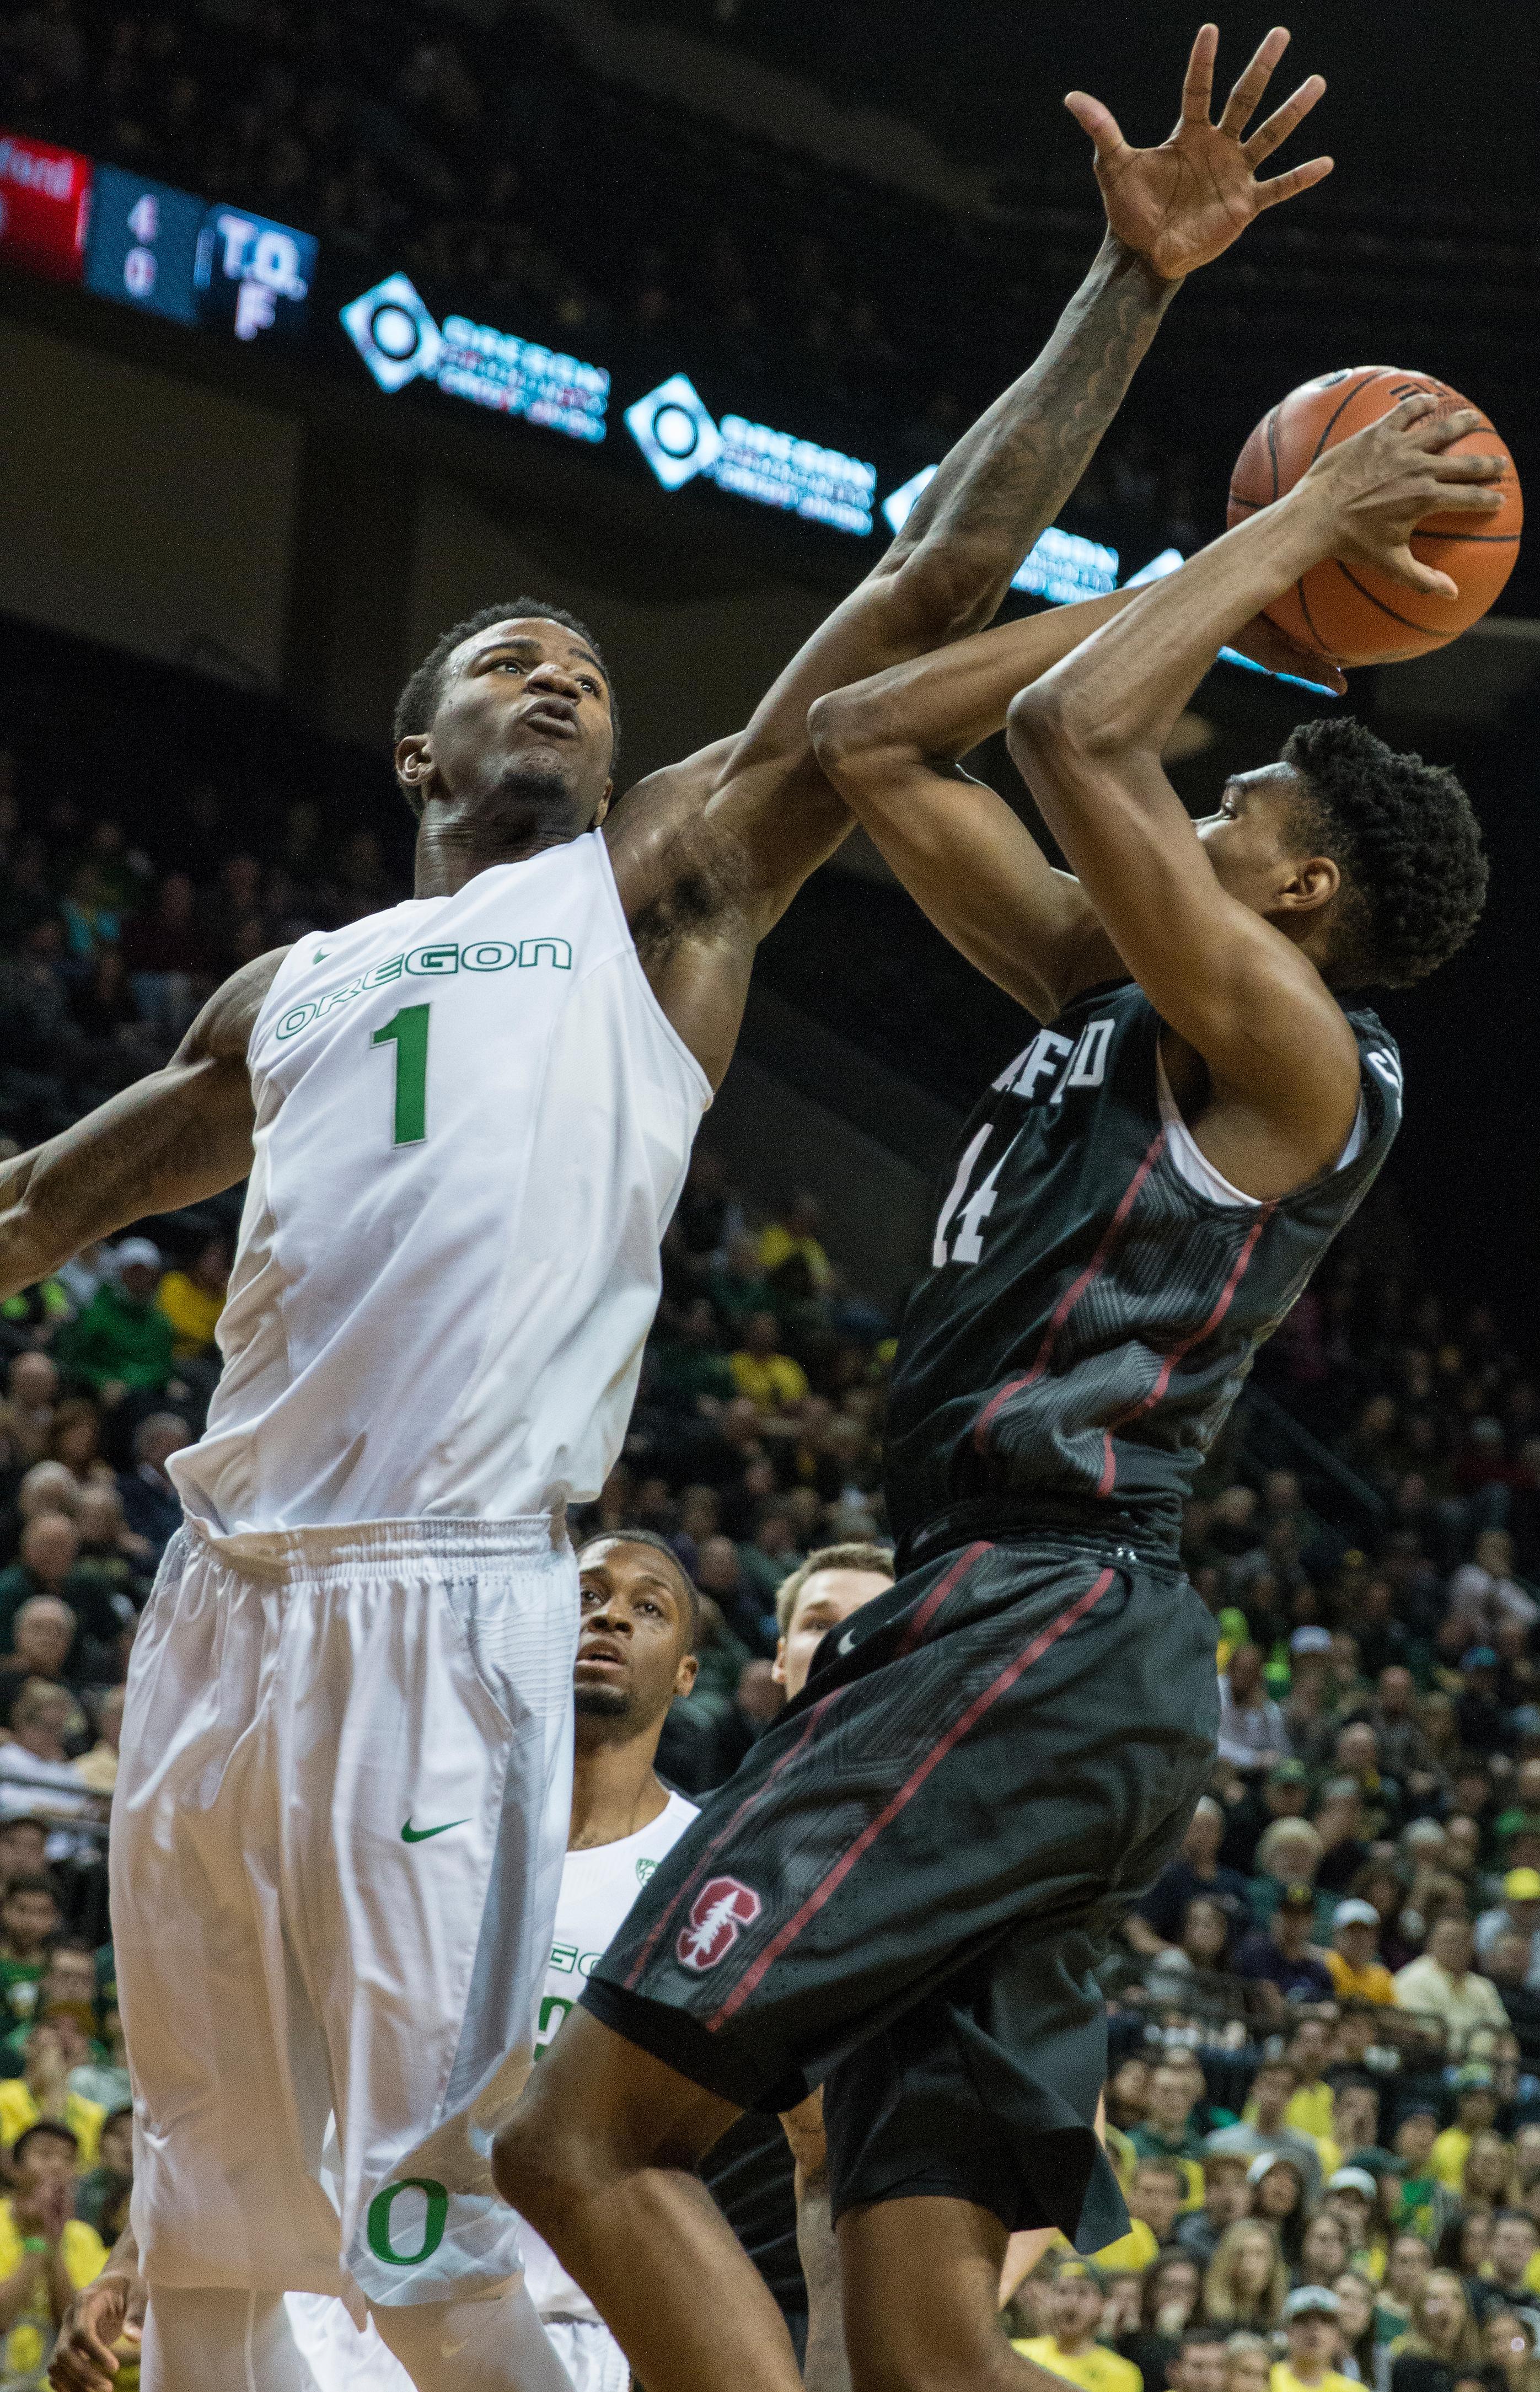 Oregons Forward Jordan Bell 1 Defends The Shot Of Stanford Guard Marcus Sheffield